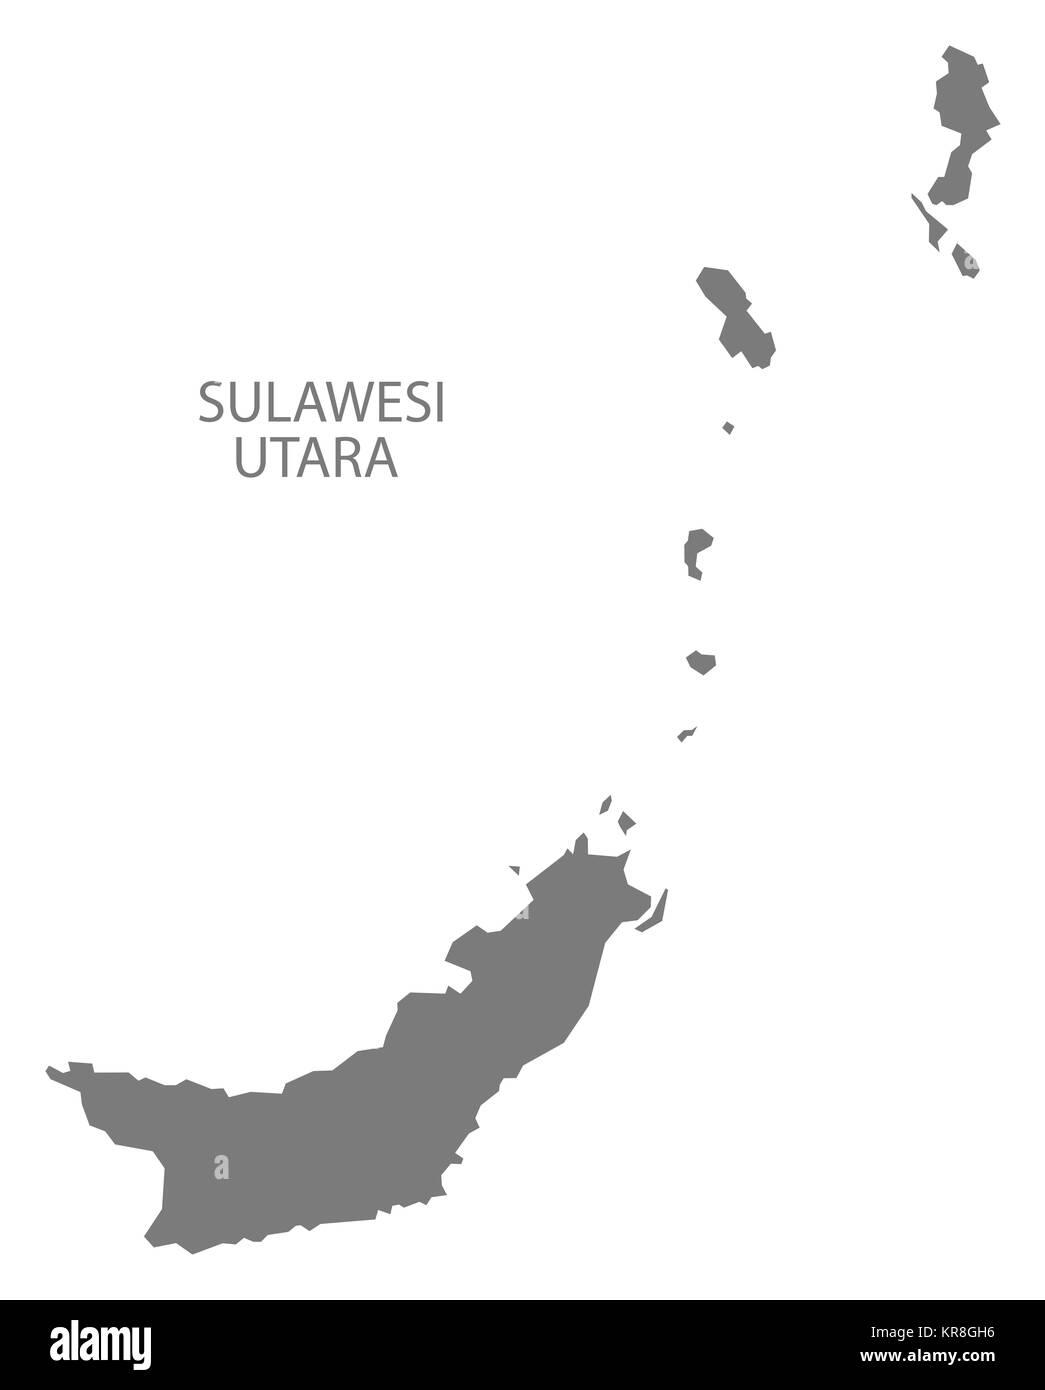 Peta Indonesia High Resolution Png : indonesia, resolution, Indonesia, Resolution, Stock, Photography, Images, Alamy